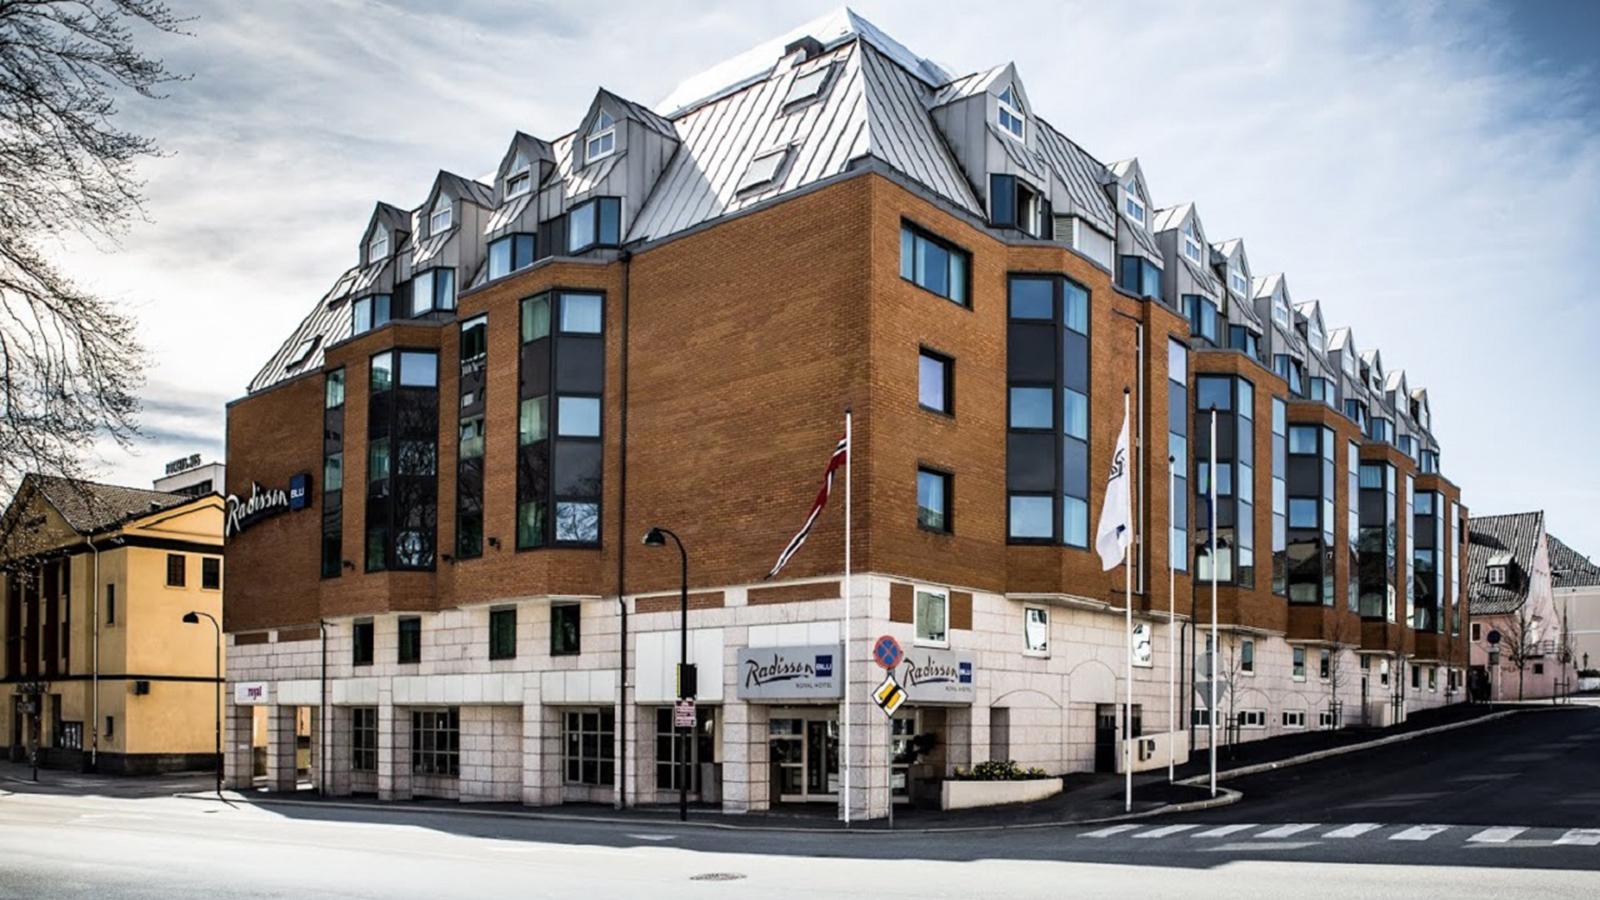 ancona grupa radisson blu royal hotel. Black Bedroom Furniture Sets. Home Design Ideas